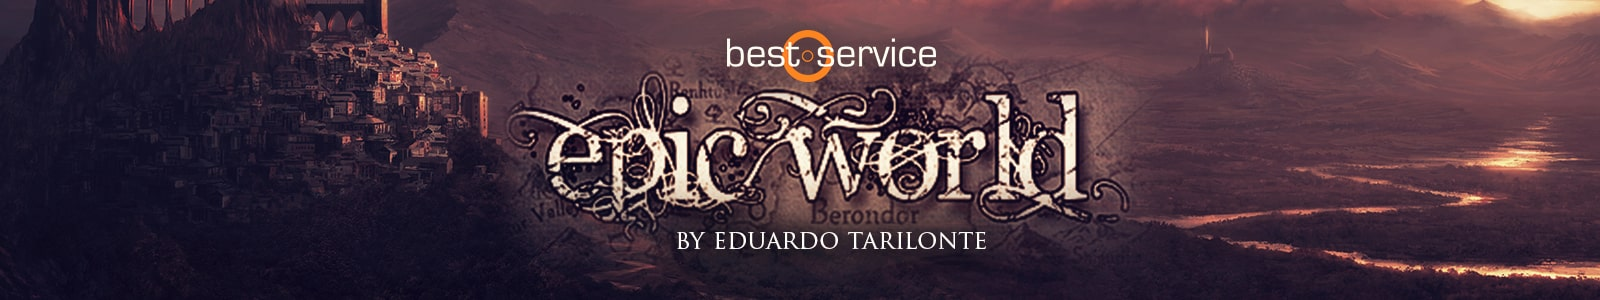 epic world by eduardo tarilonte